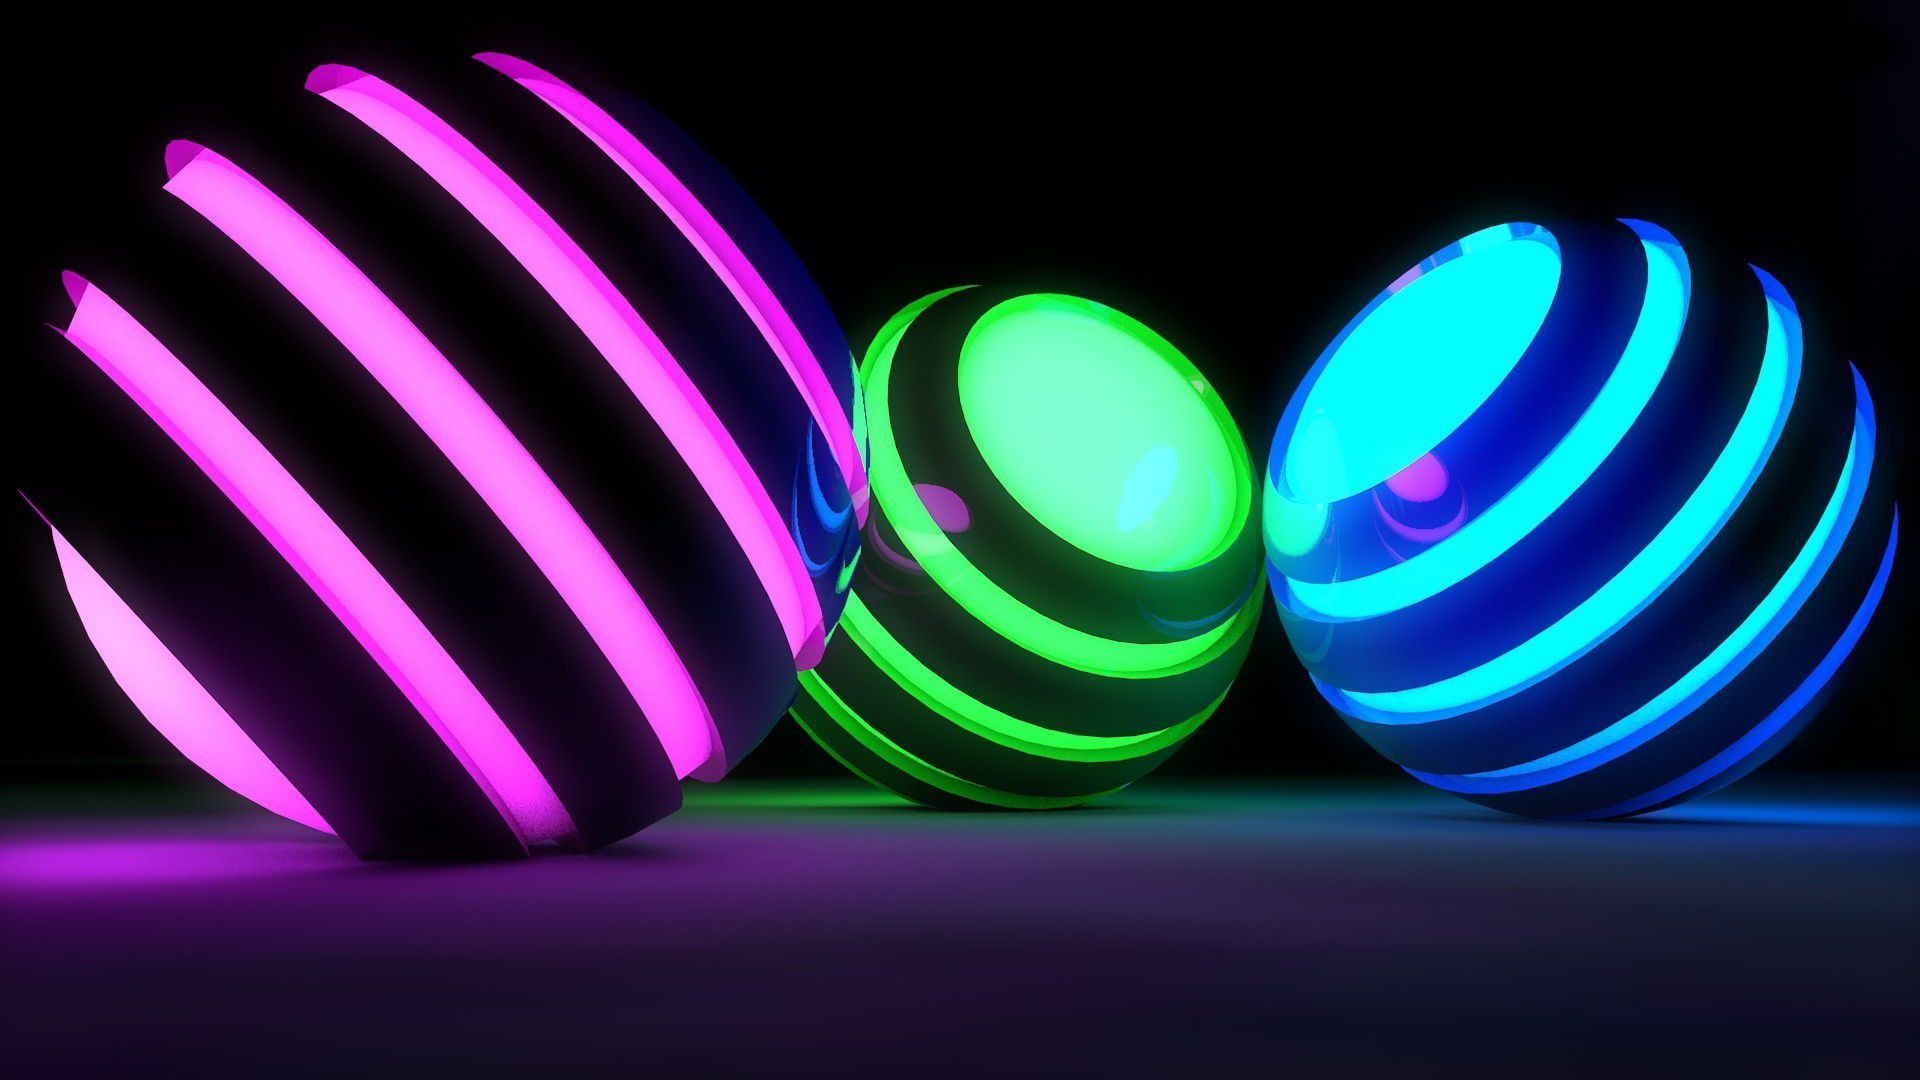 pretty neon backgrounds